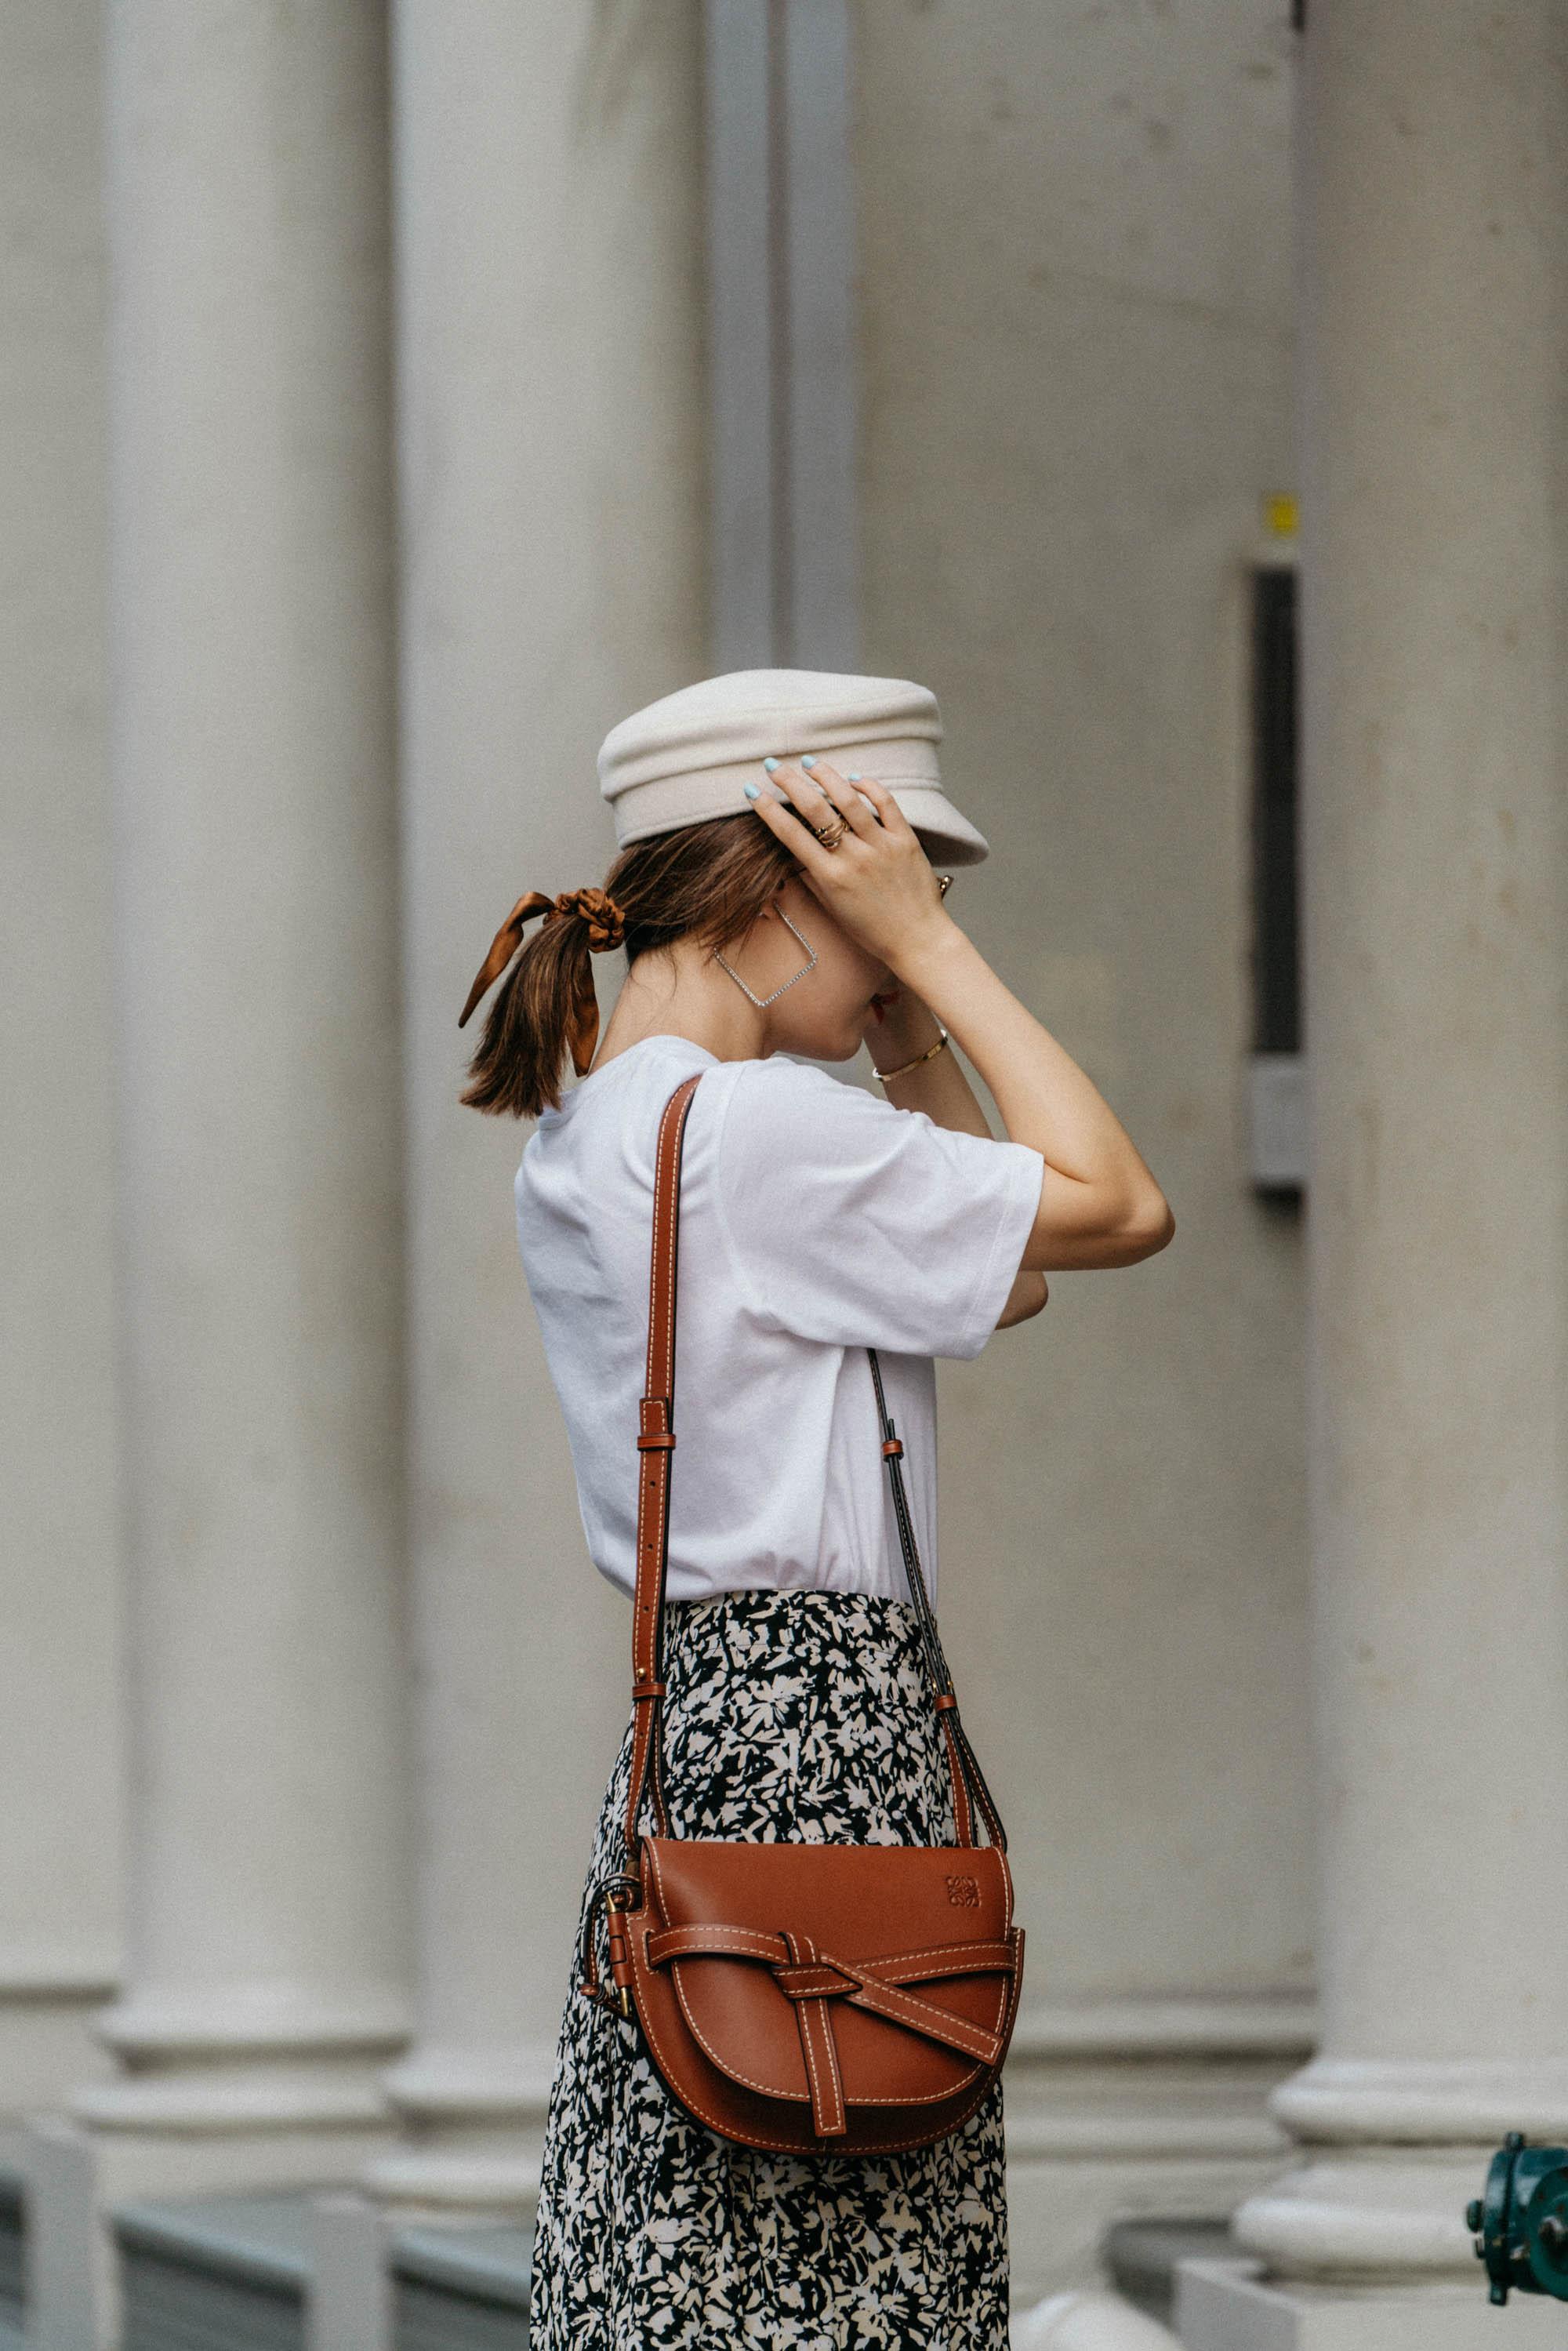 Common Odds Shirt,  Proenza Schouler Skirt,  Loewe Bag ,  Ruslan Baginskiy Hat ,  Donni Scrunchie ,  AREA Earrings